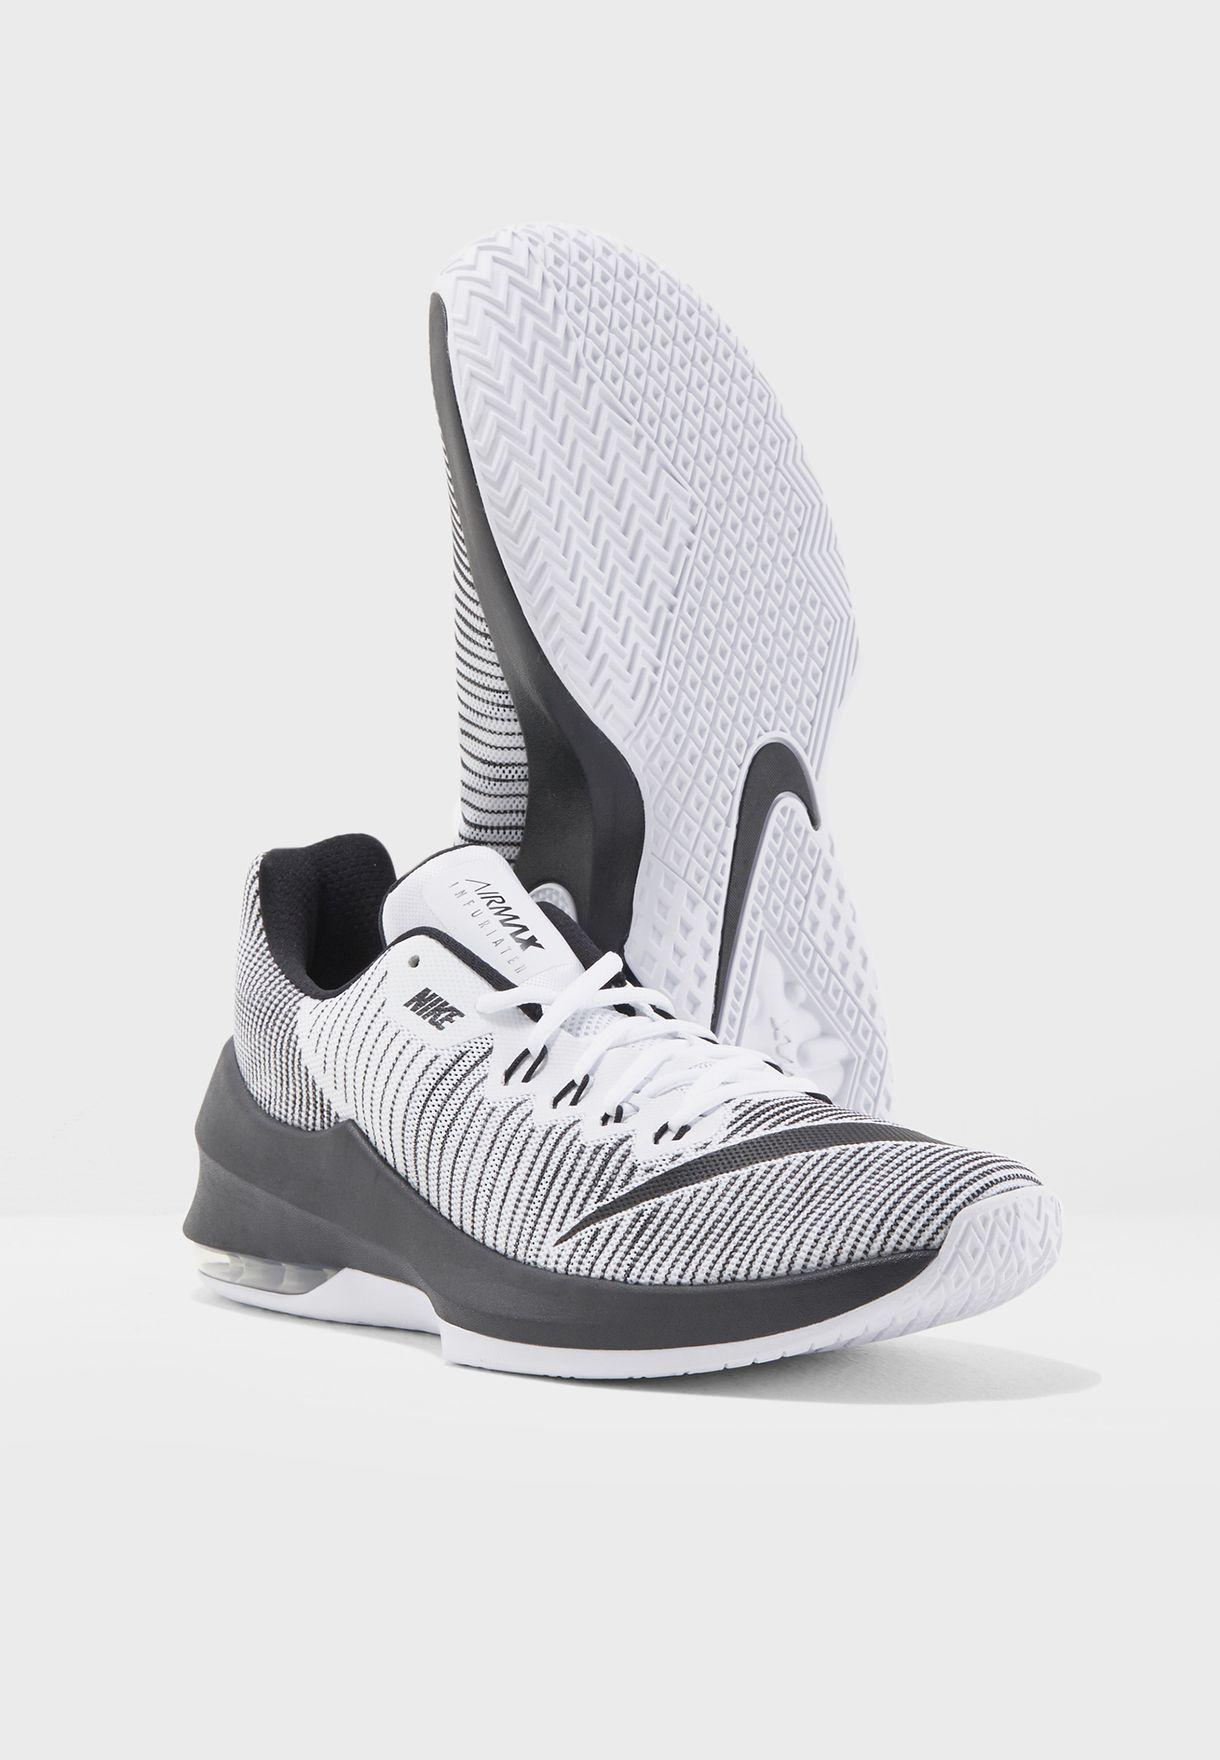 7ce00e4218aa Shop Nike monochrome Air Max Infuriate 2 Low 908975-100 for Men ...